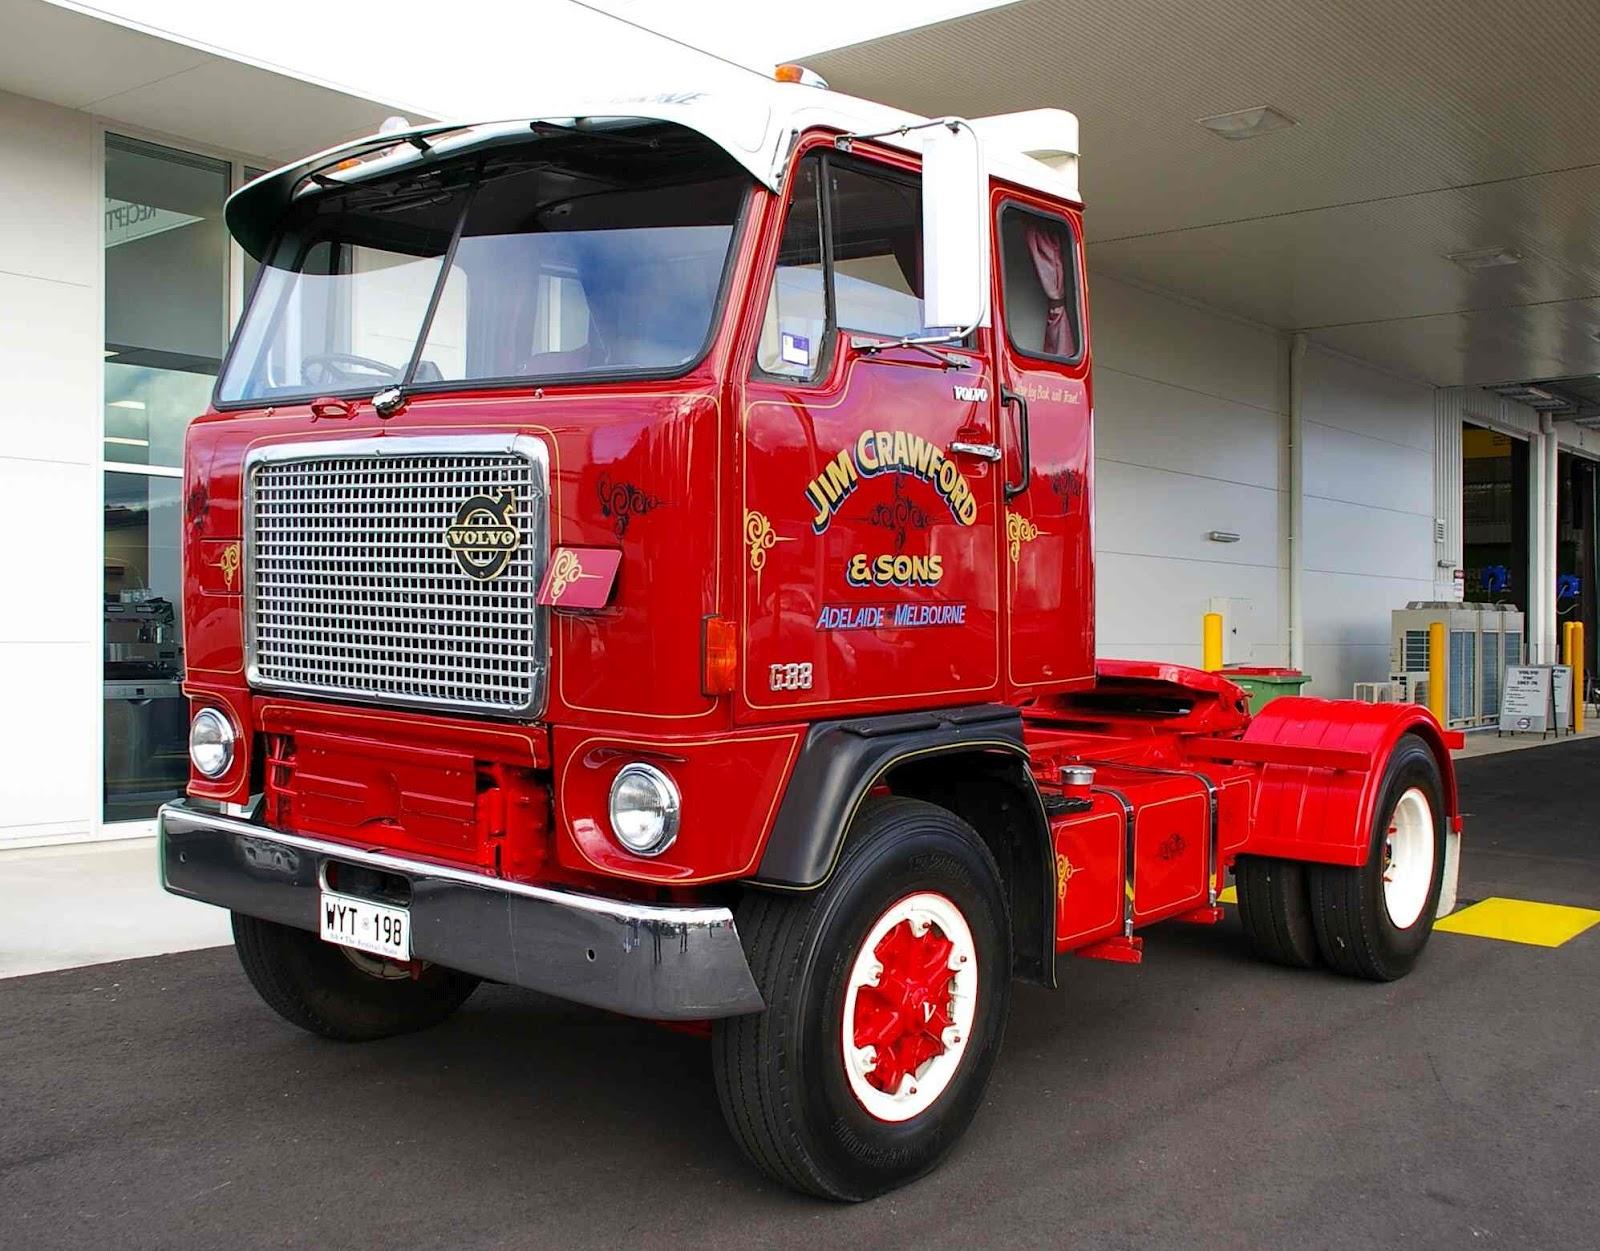 Historic Trucks: Opening of CMV Albury Wodonga May 2012